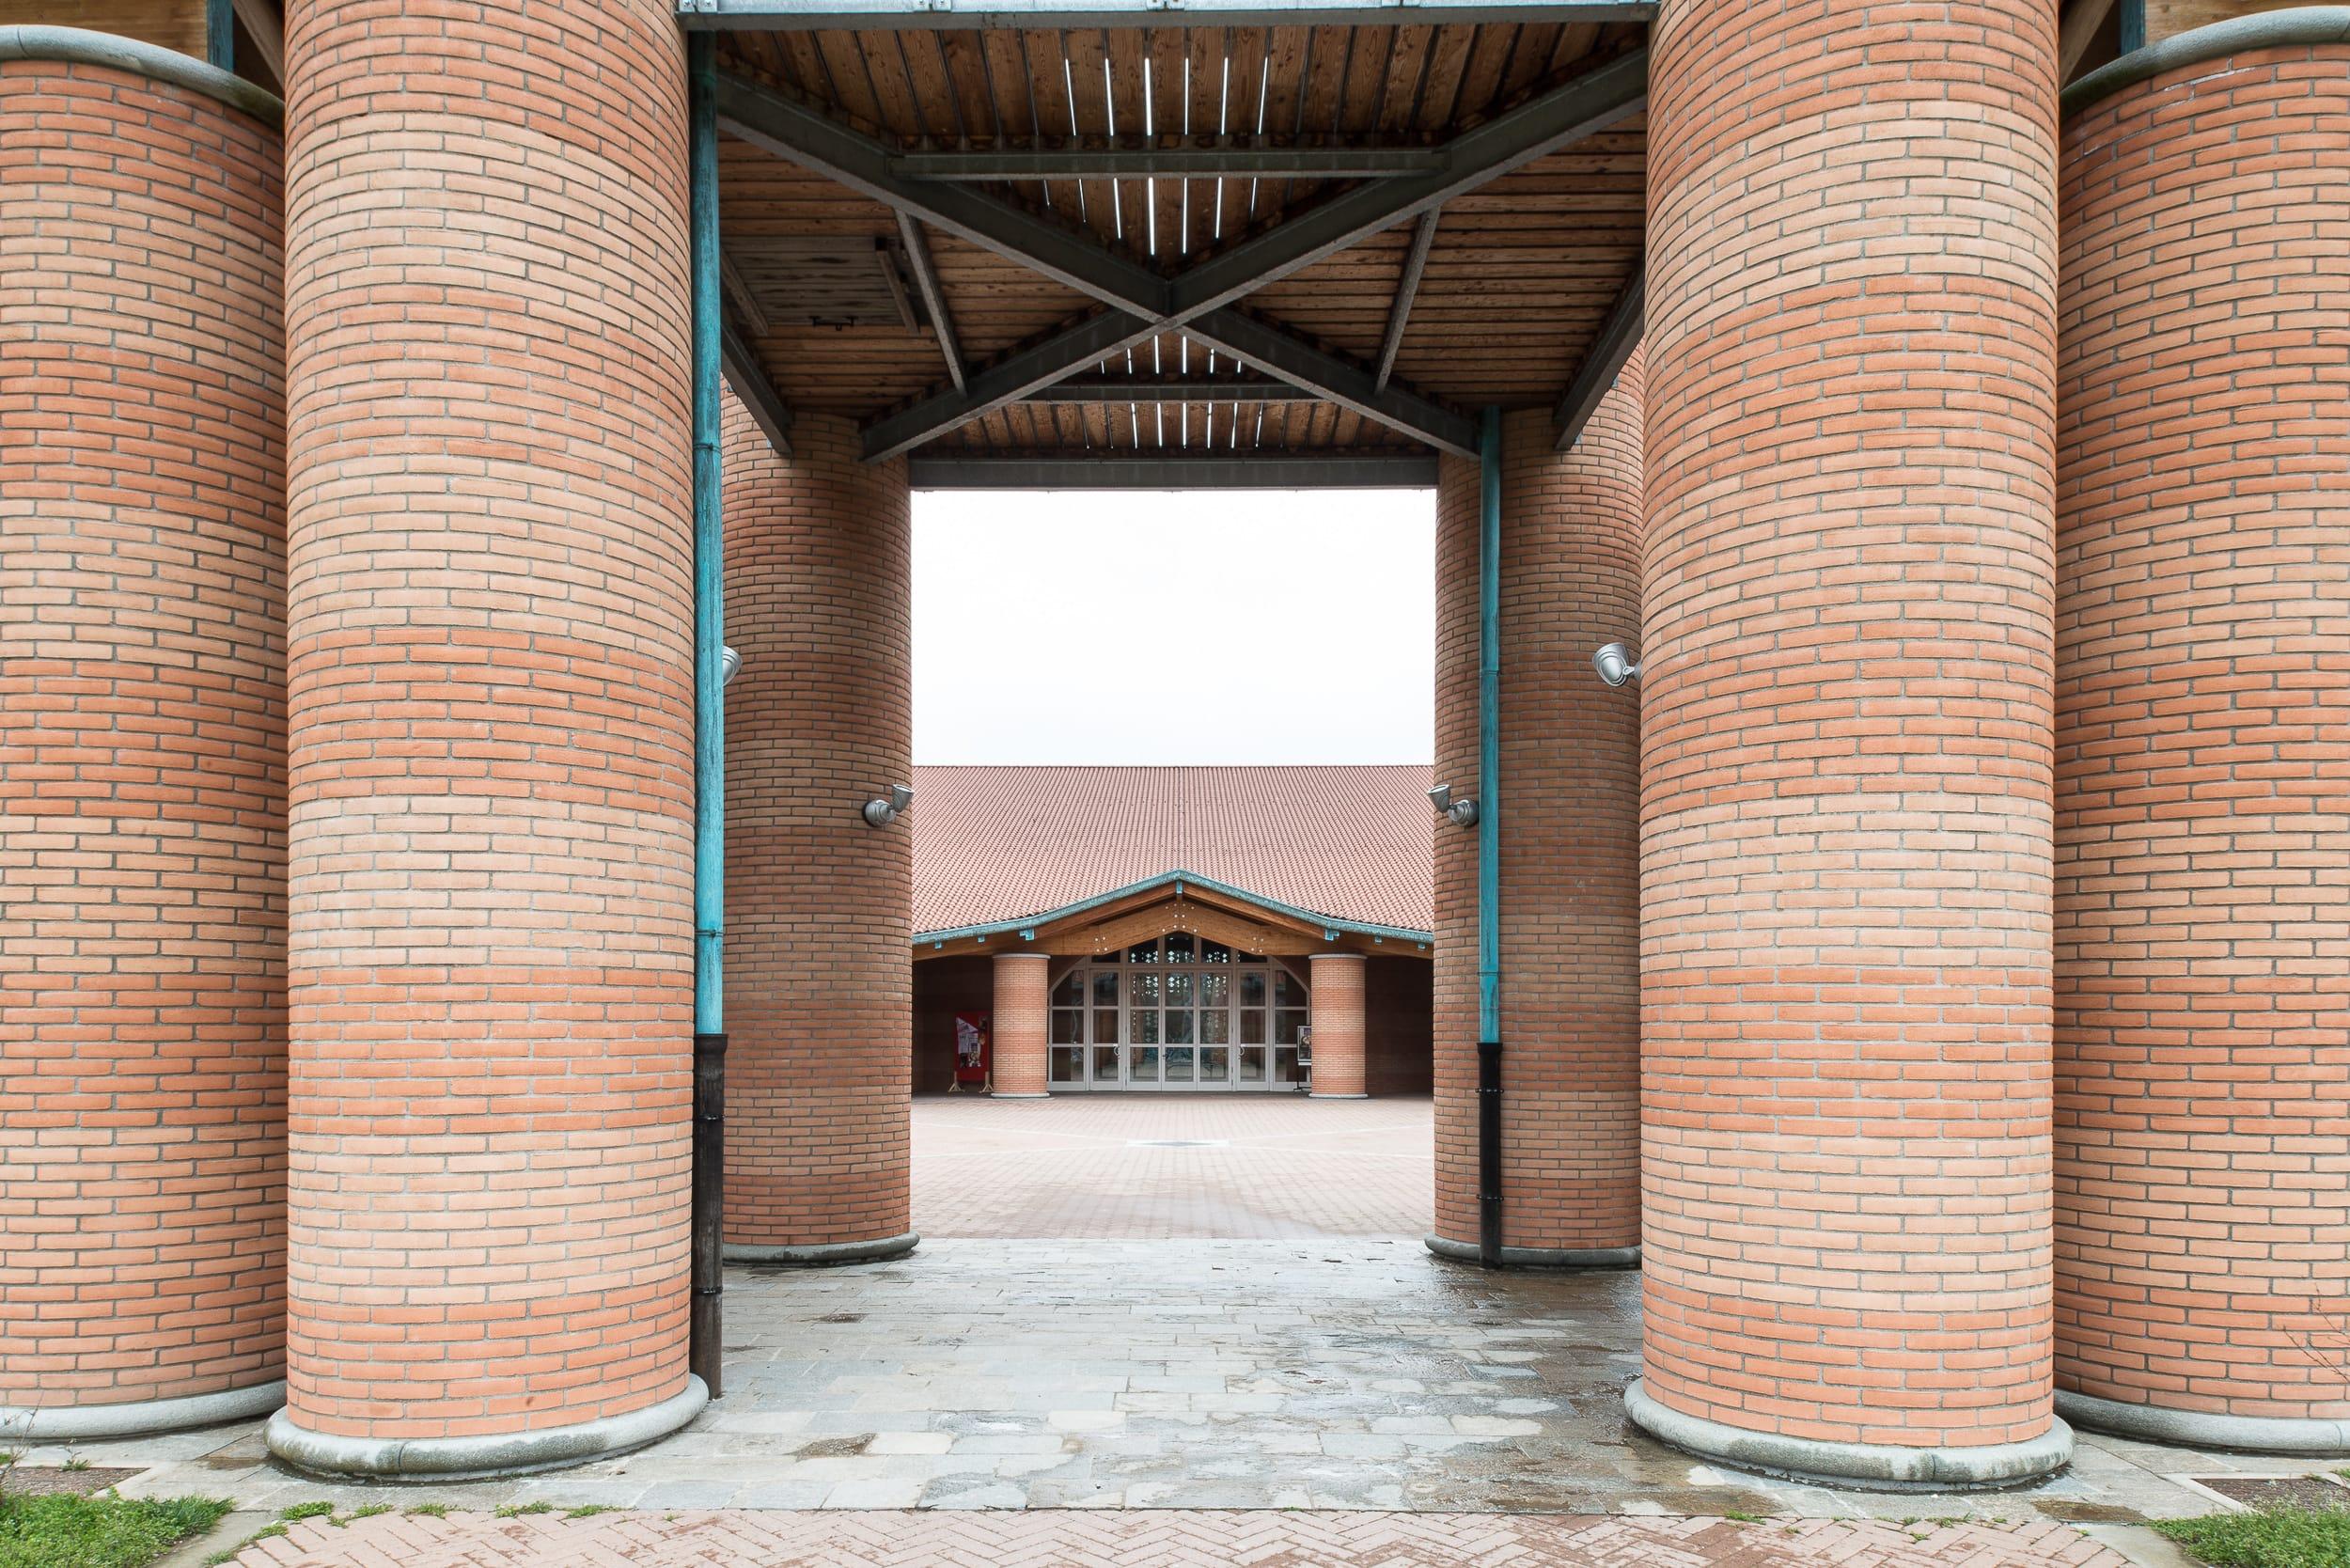 Architettura italiana - Piastrelle san giuliano milanese ...